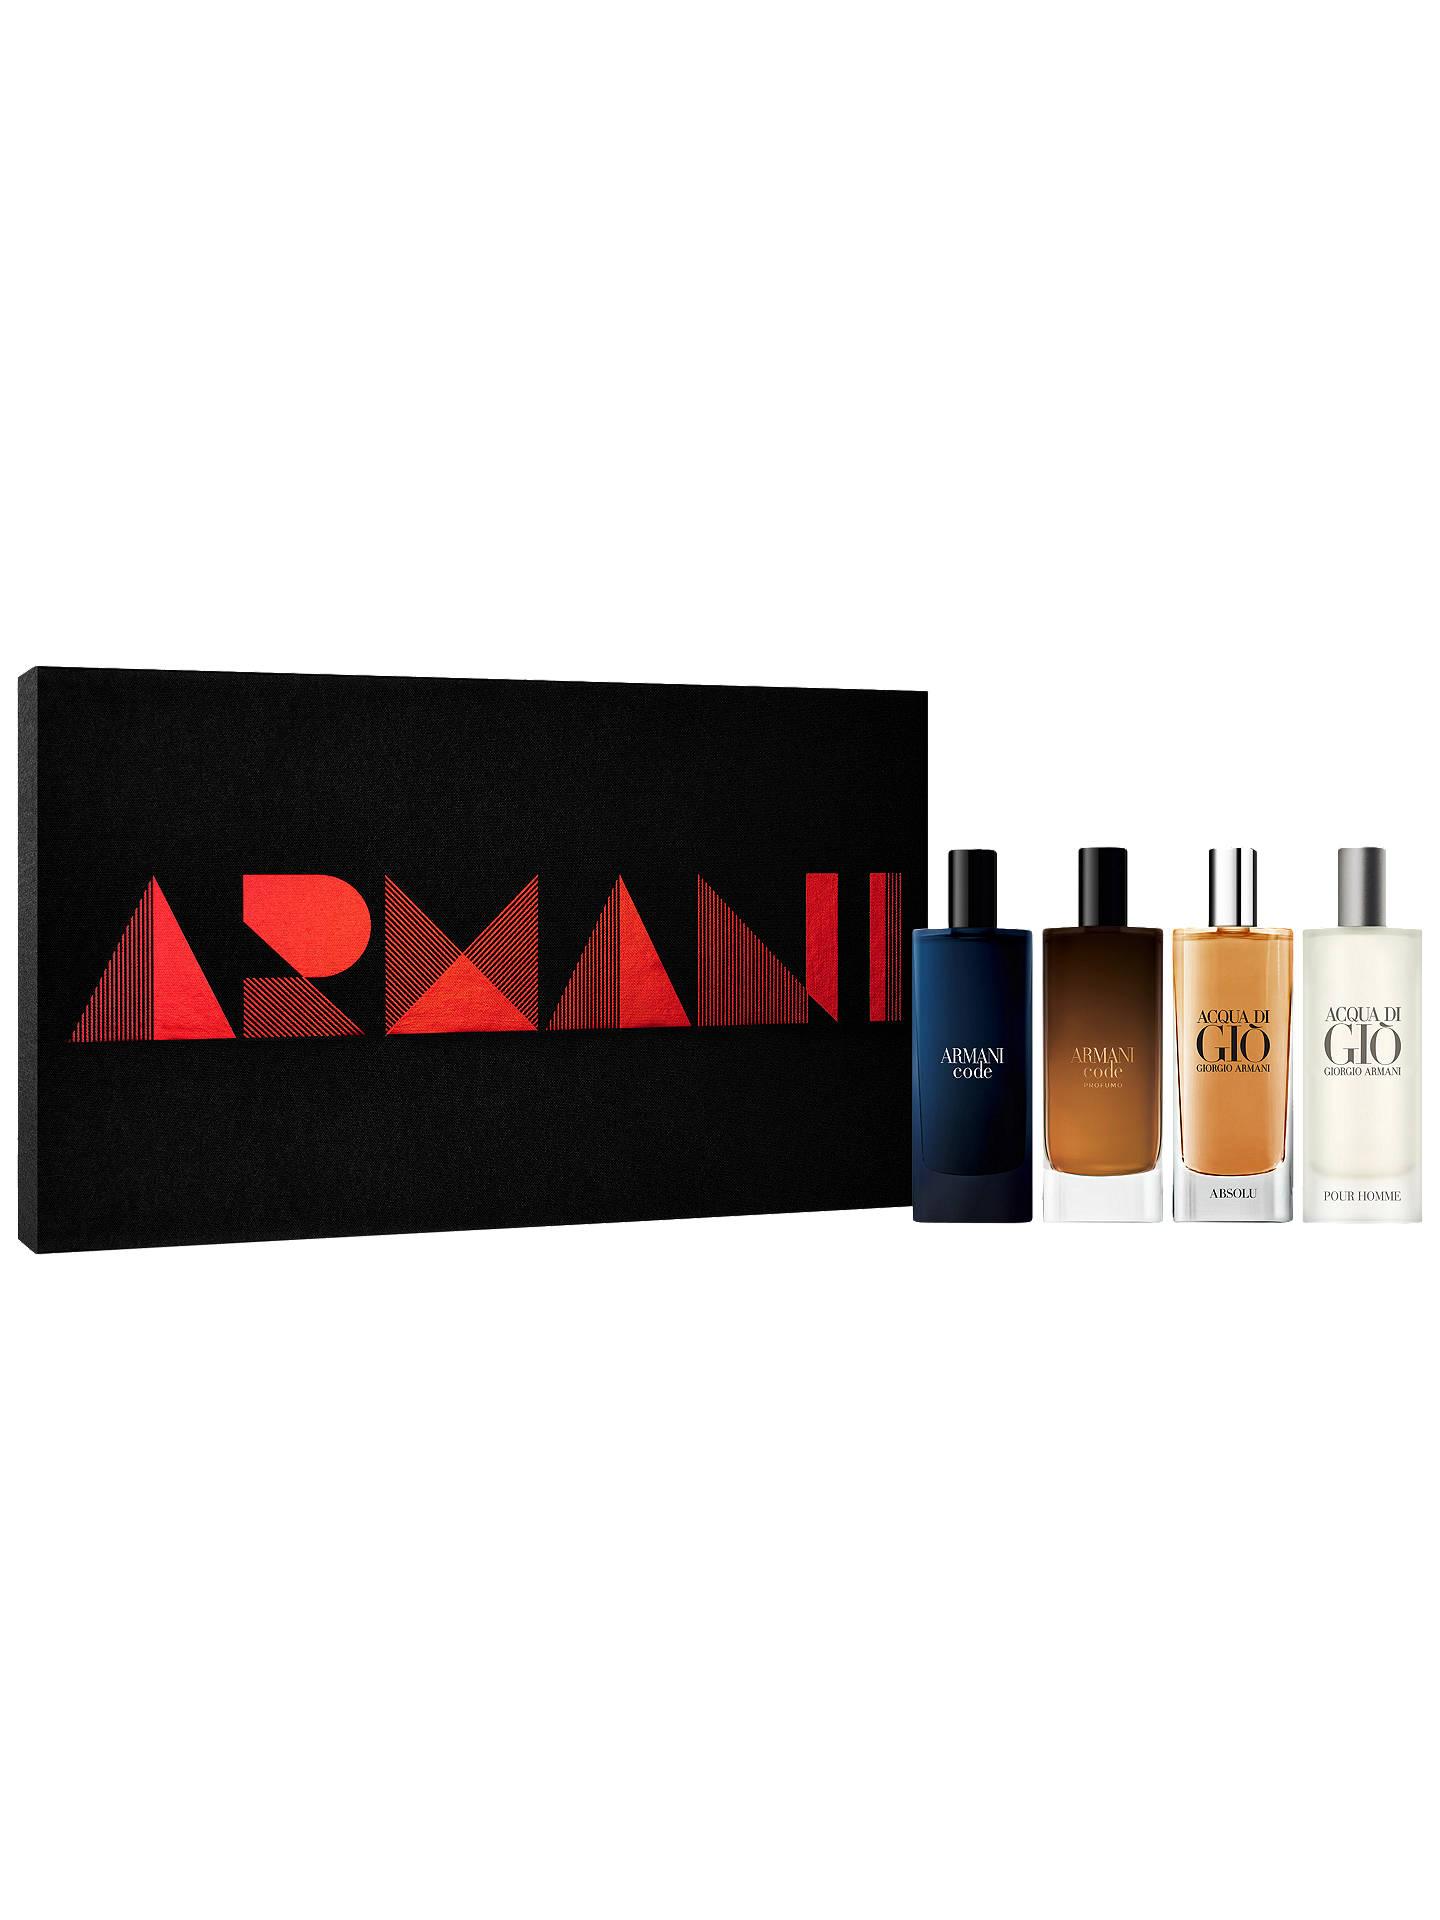 BuyGiorgio Armani Travel Spray Christmas Gift Set For Him 4 x 15ml Online  at johnlewis. 85db1c4bad40